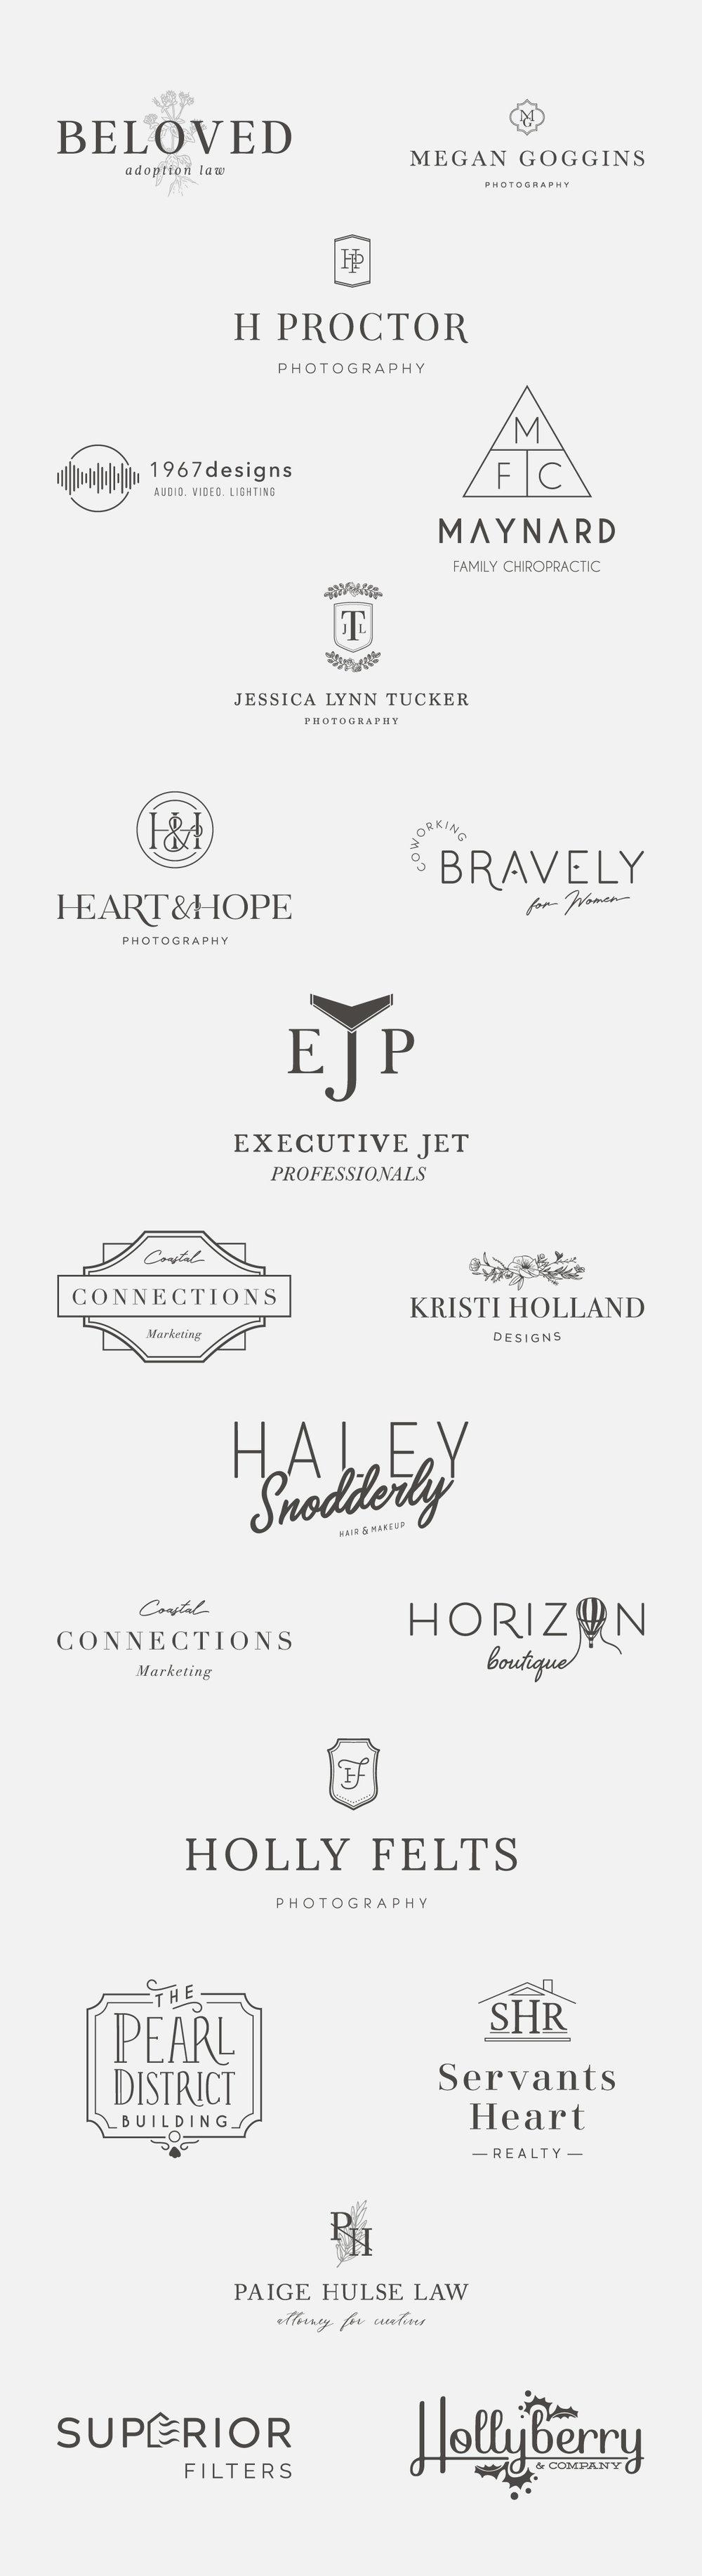 HayleyBighamDesigns-BrandingLogoProjects-TulsaGraphicDesigner